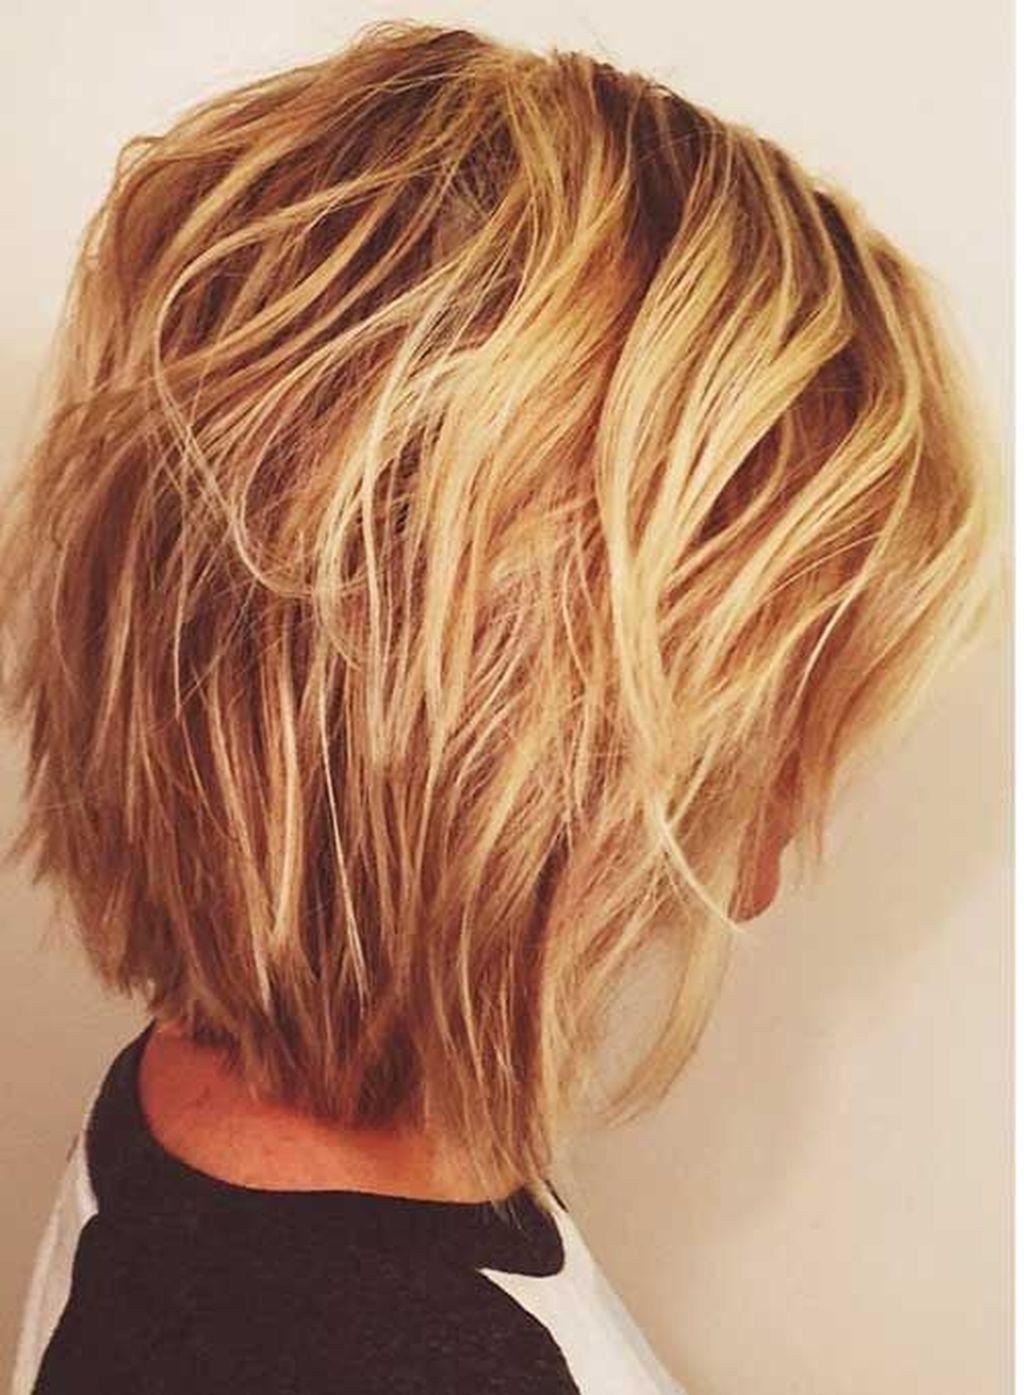 Fresh Short Layered Hairstyles Ideas 53 | Short hair with layers, Medium  layered hair, Hair styles